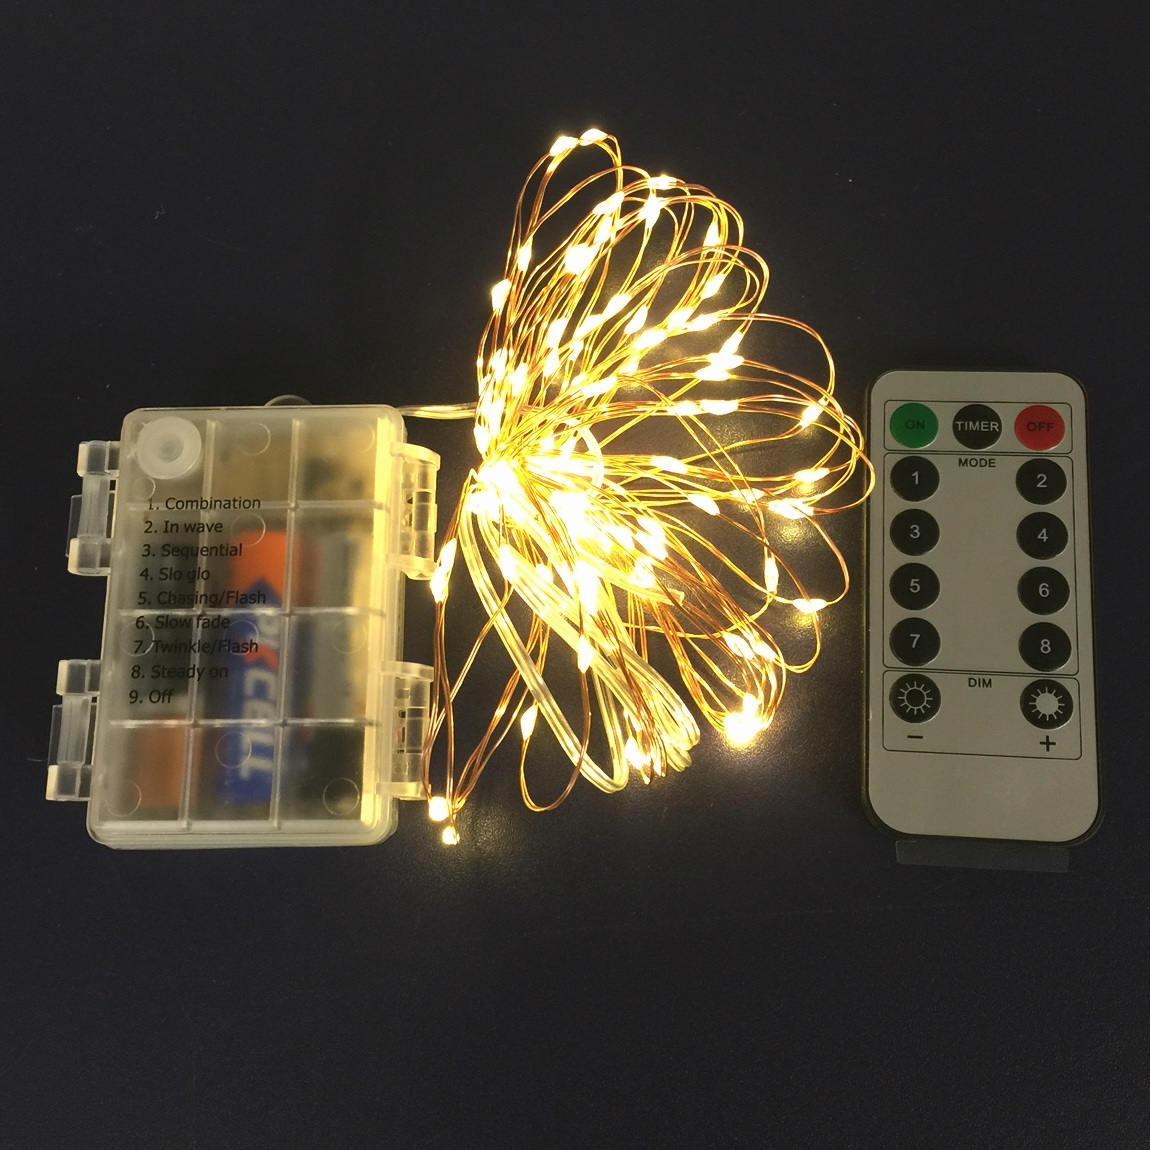 Luces Navideñas Pila 50 Micro Led 5 Metros A Control Remoto